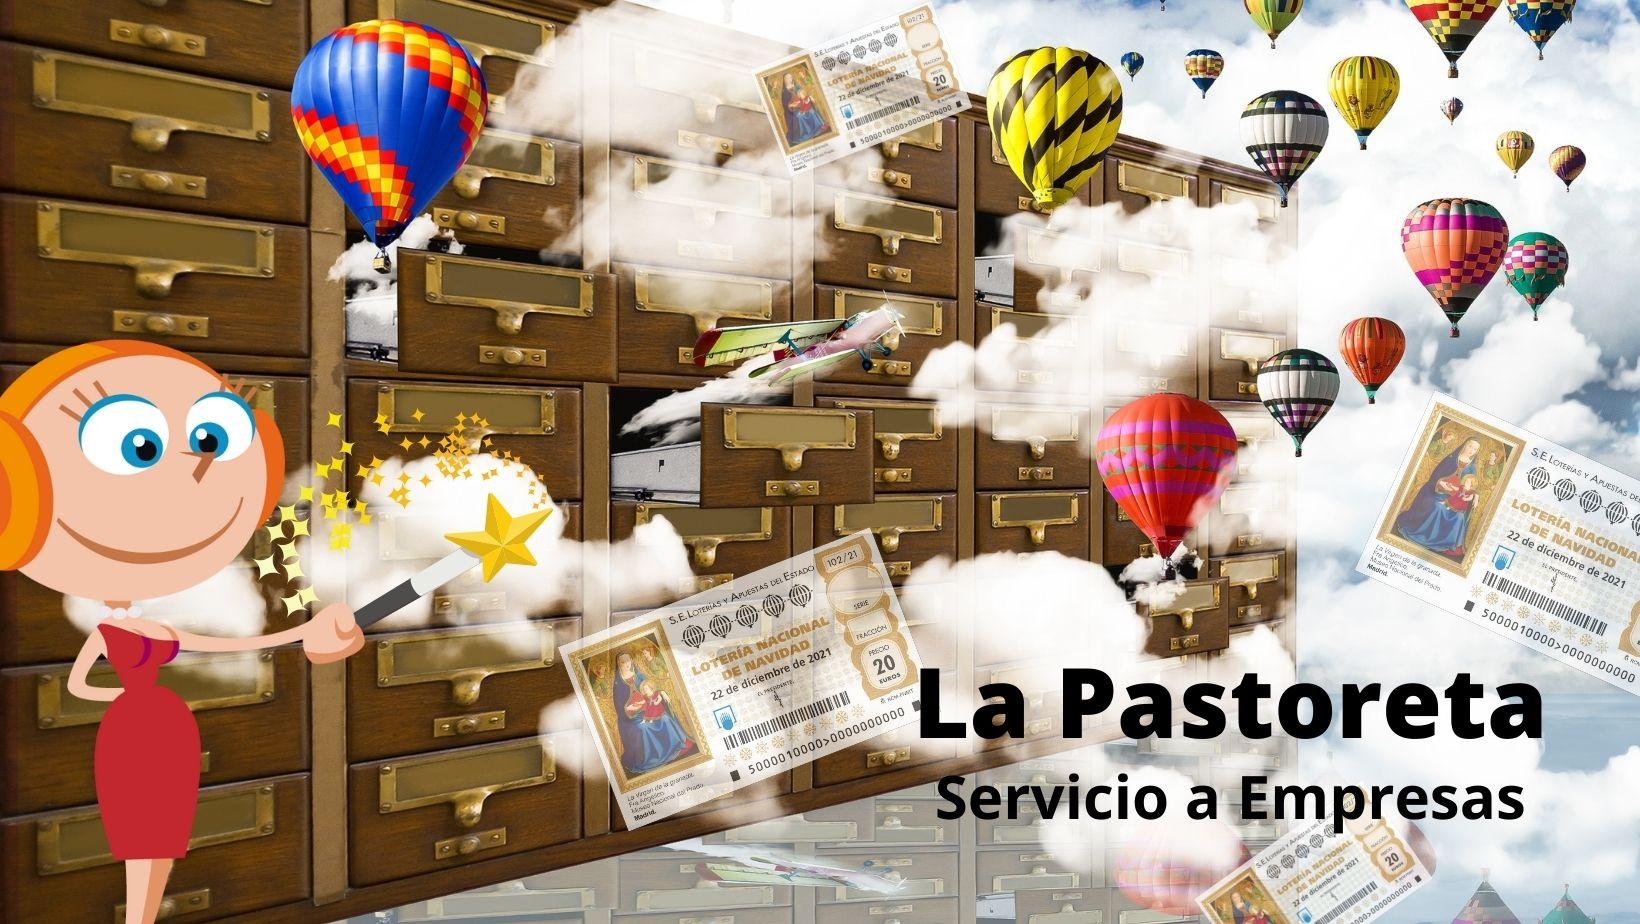 La Pastoreta, servicio a empresas.